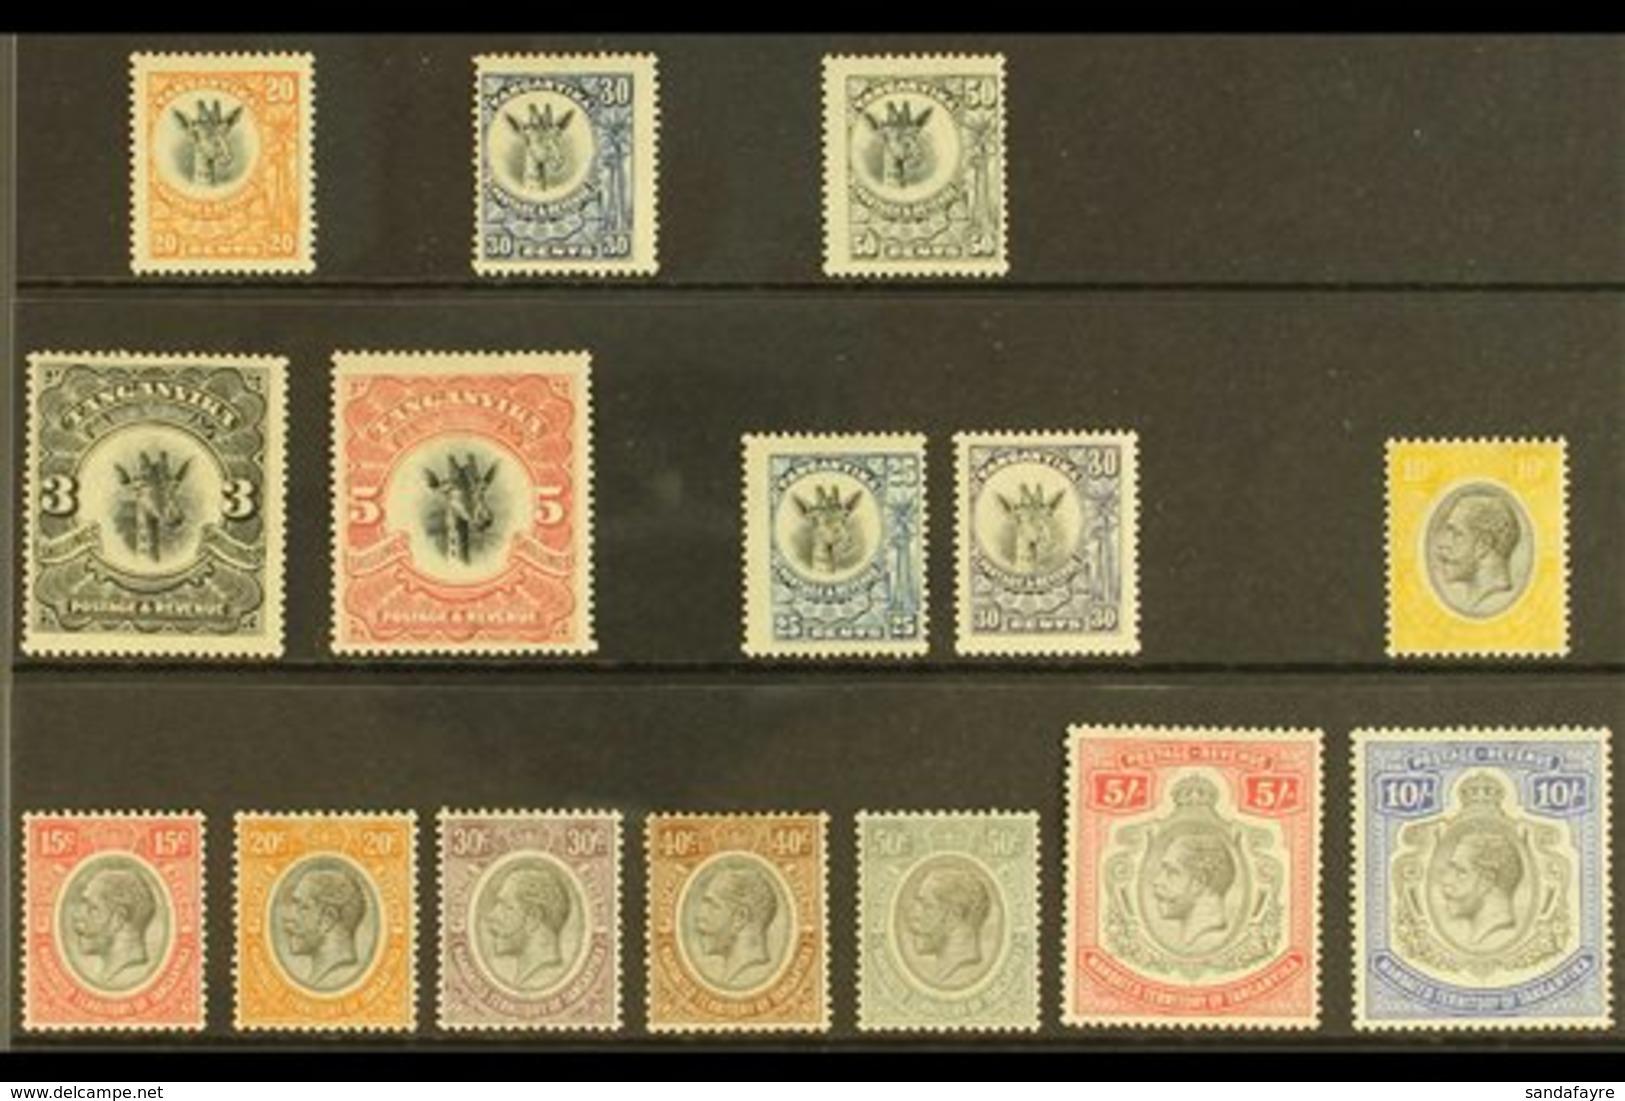 "1922-31 ALL DIFFERENT MINT SELECTION Presented On A Stock Card & Includes 1922-24 ""Giraffe"" 20c, 30c & 50c, P14 Wmk Side - Kenya, Uganda & Tanganyika"